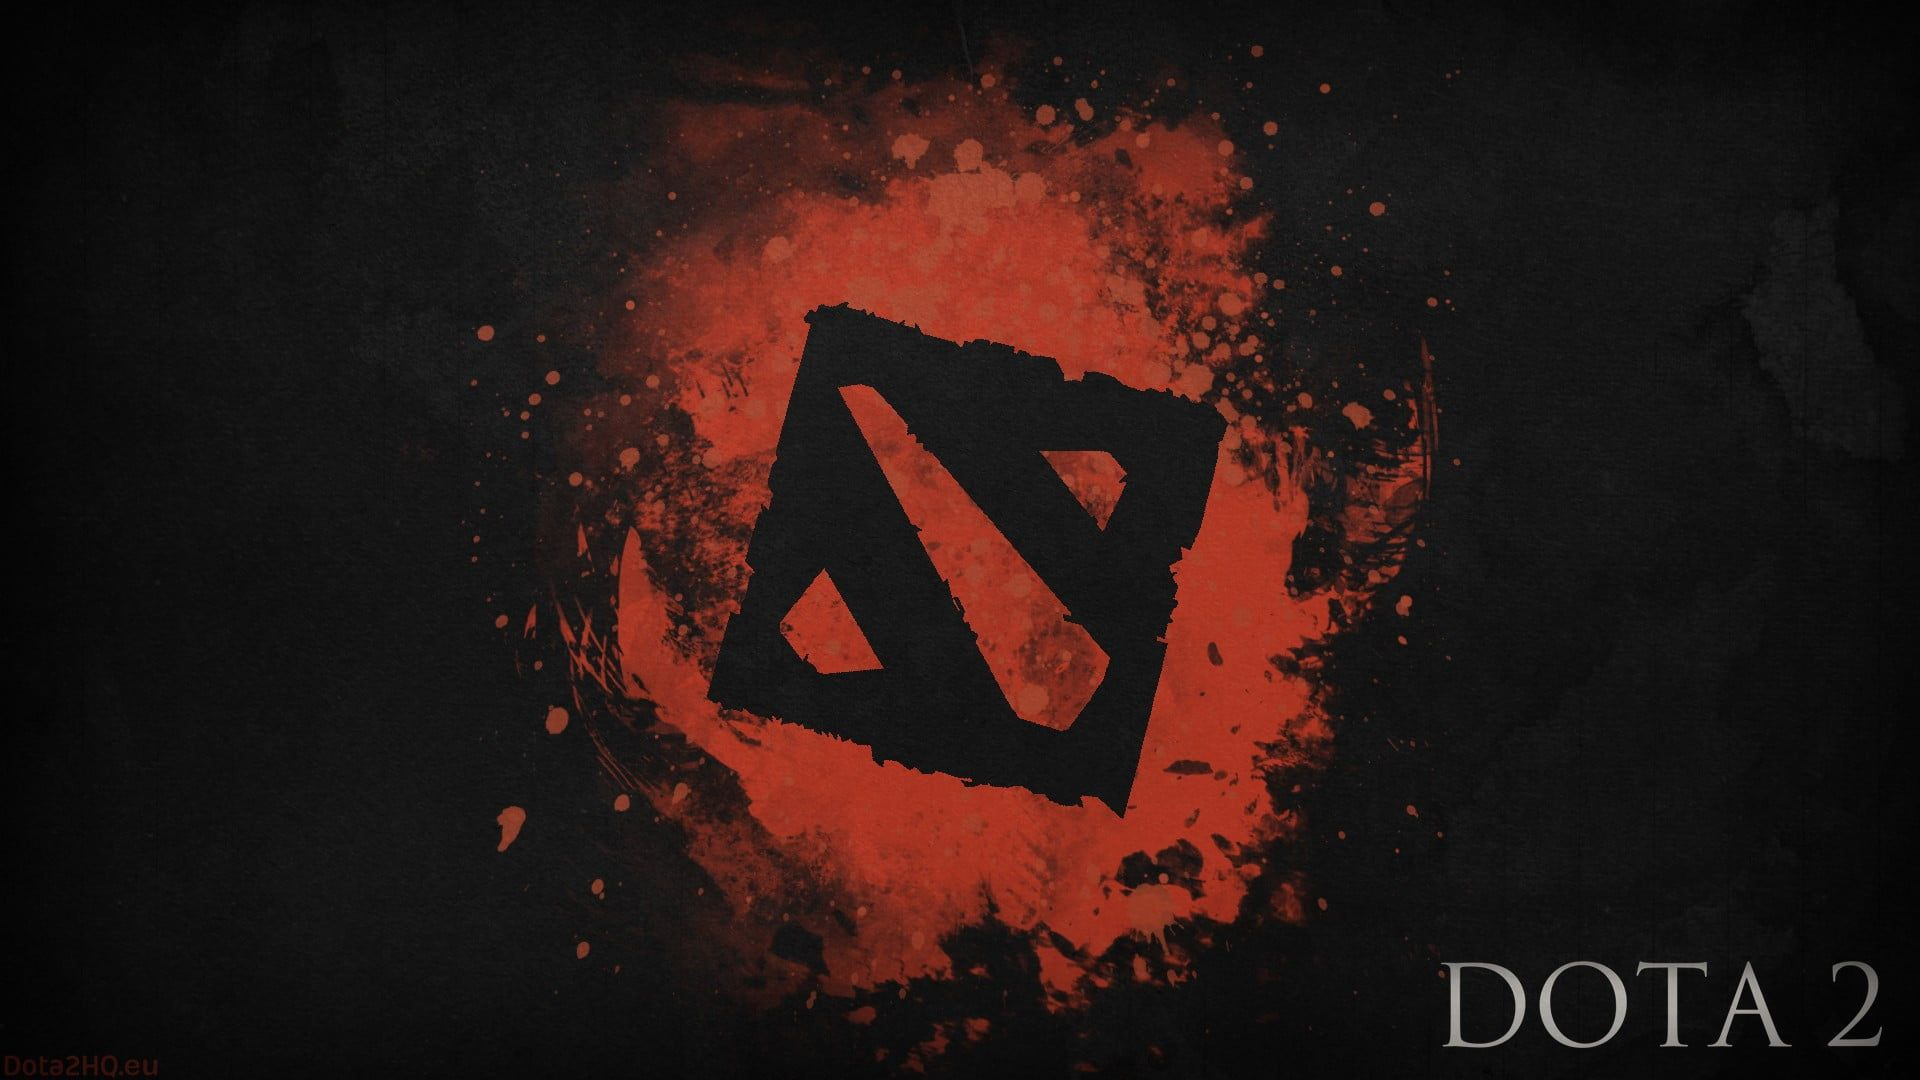 Dota 2 Logo Wallpaper Dota 2 Dota Defense Of The Ancient Valve Valve Corporation 1080p Wallpape Dota 2 Wallpaper Hd Wallpaper 1920x1080 Dota 2 Hd Wallpaper